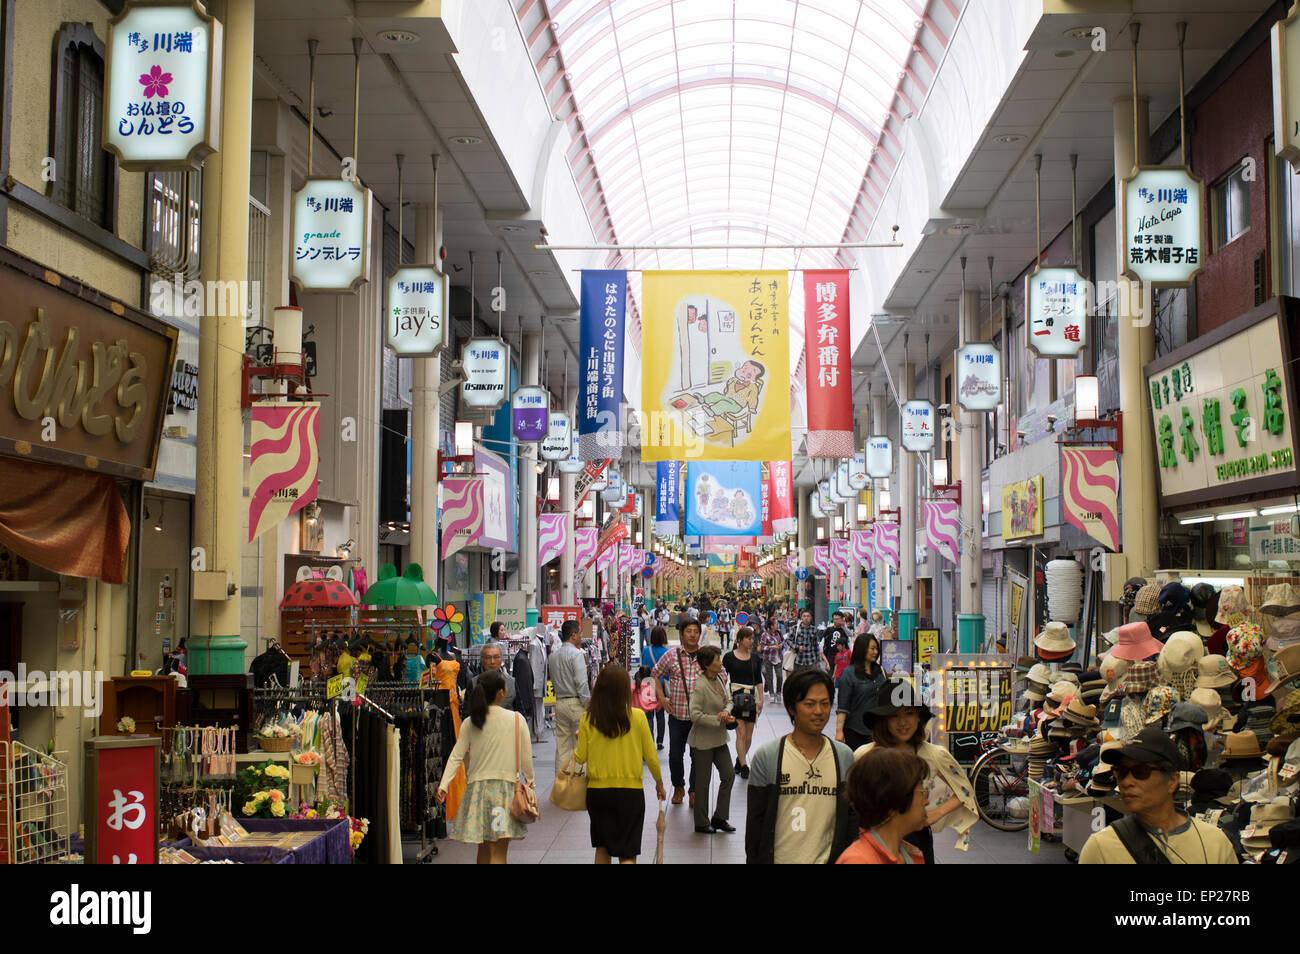 Kawabata Shopping Arcade in Fukuoka, Kyushu, Japan. - Stock Image